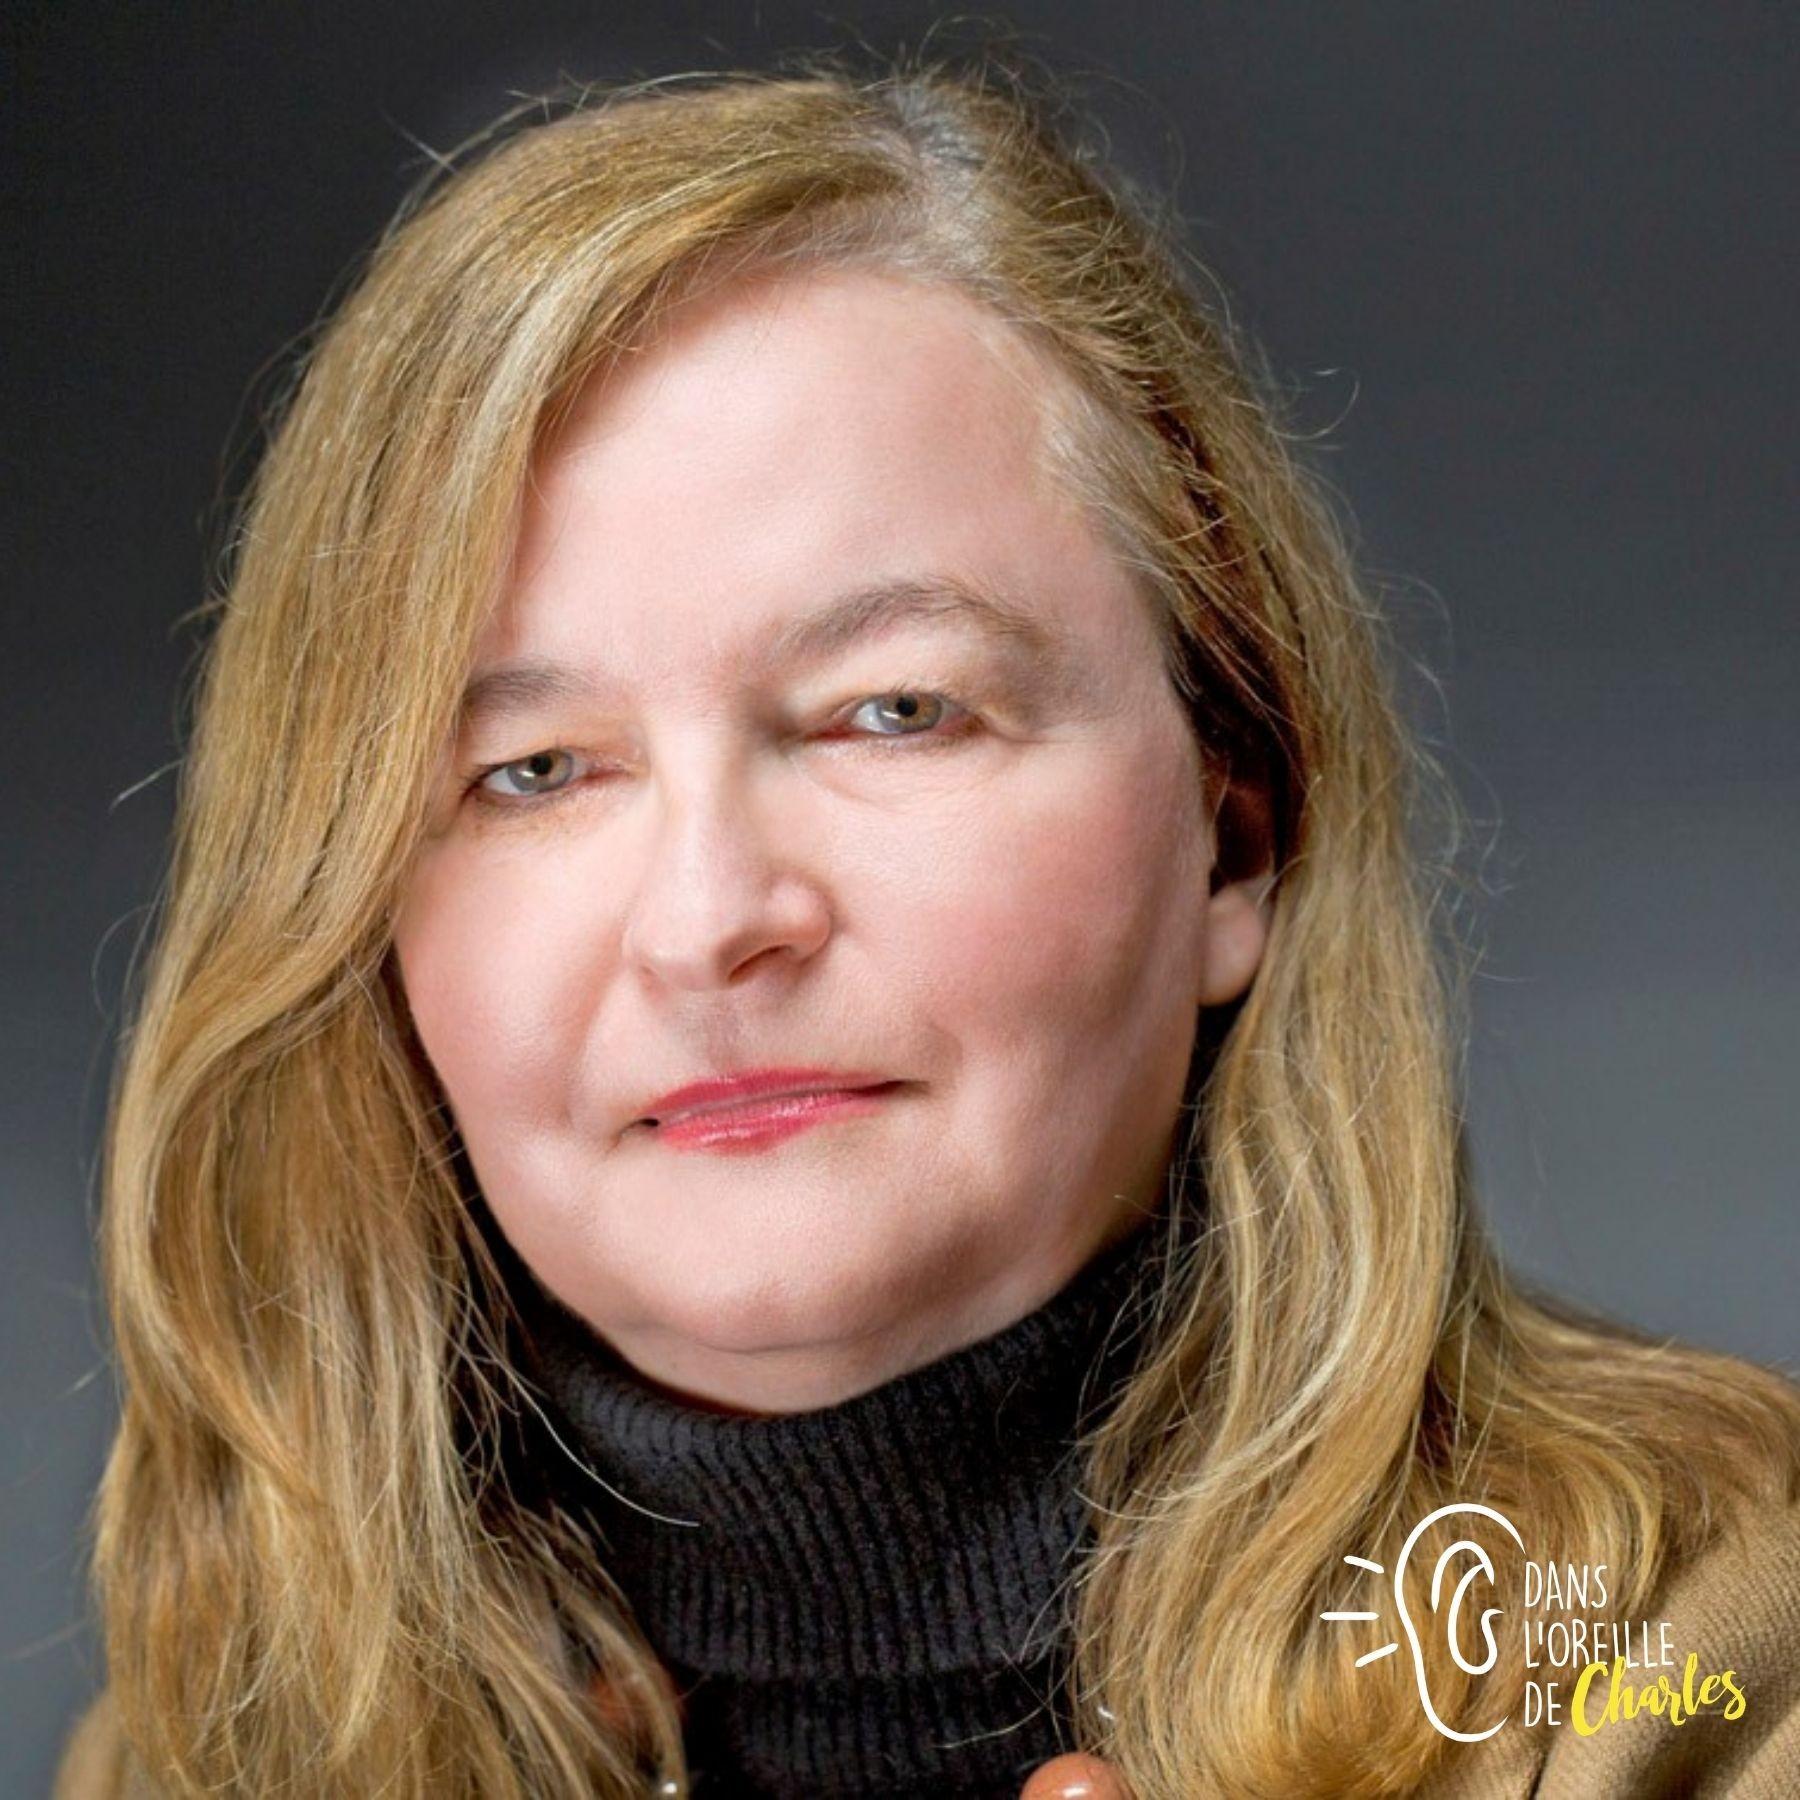 51% - Nathalie Loiseau